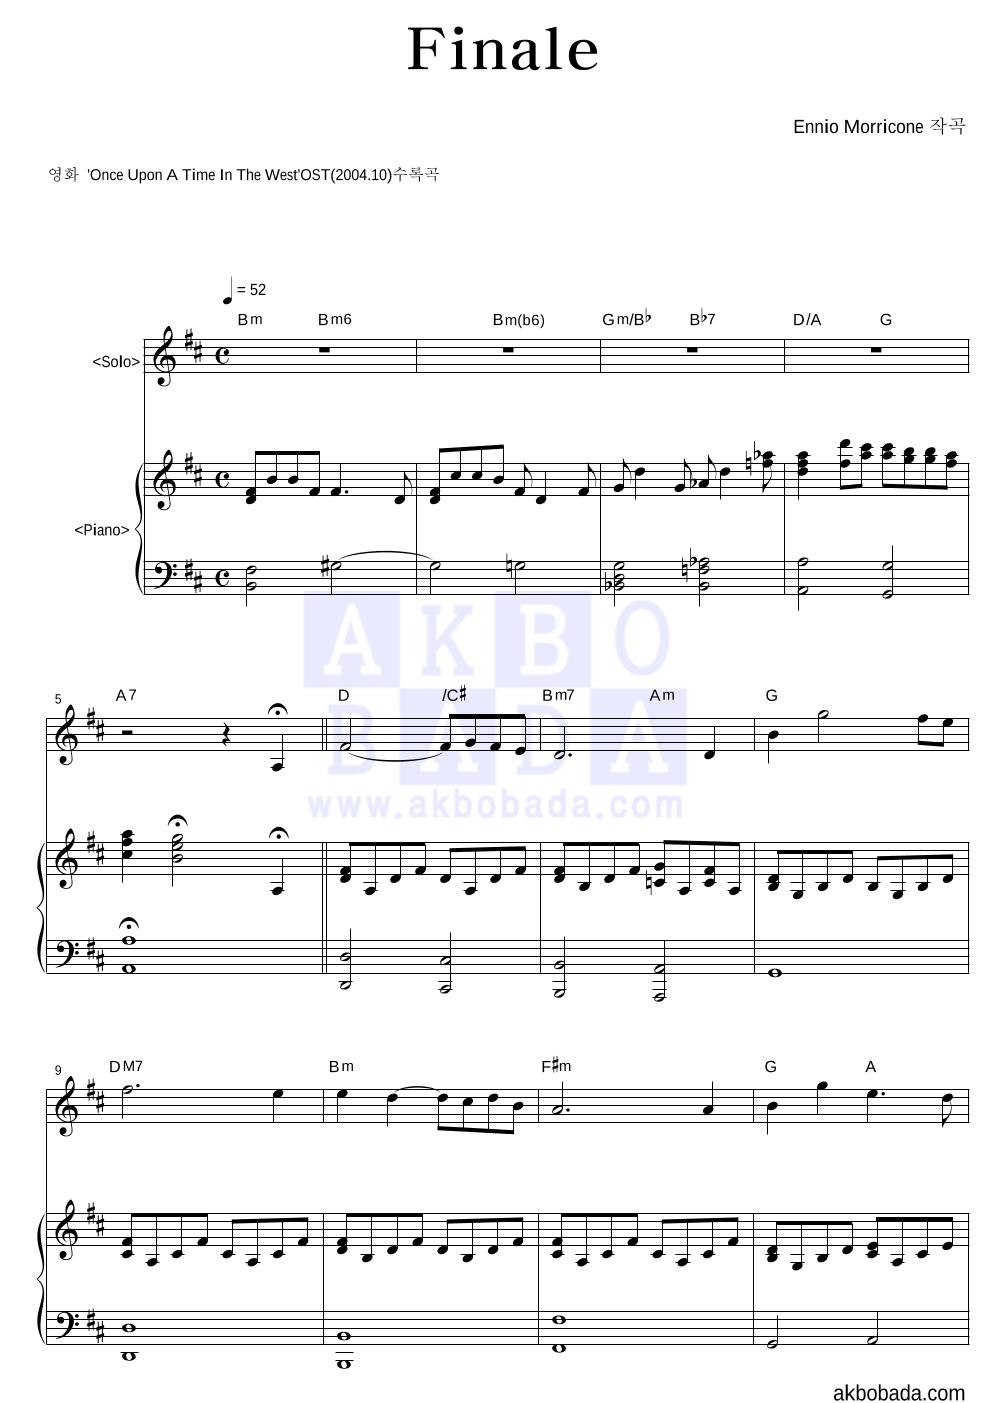 Ennio Morricone - Finale 피아노 3단 악보